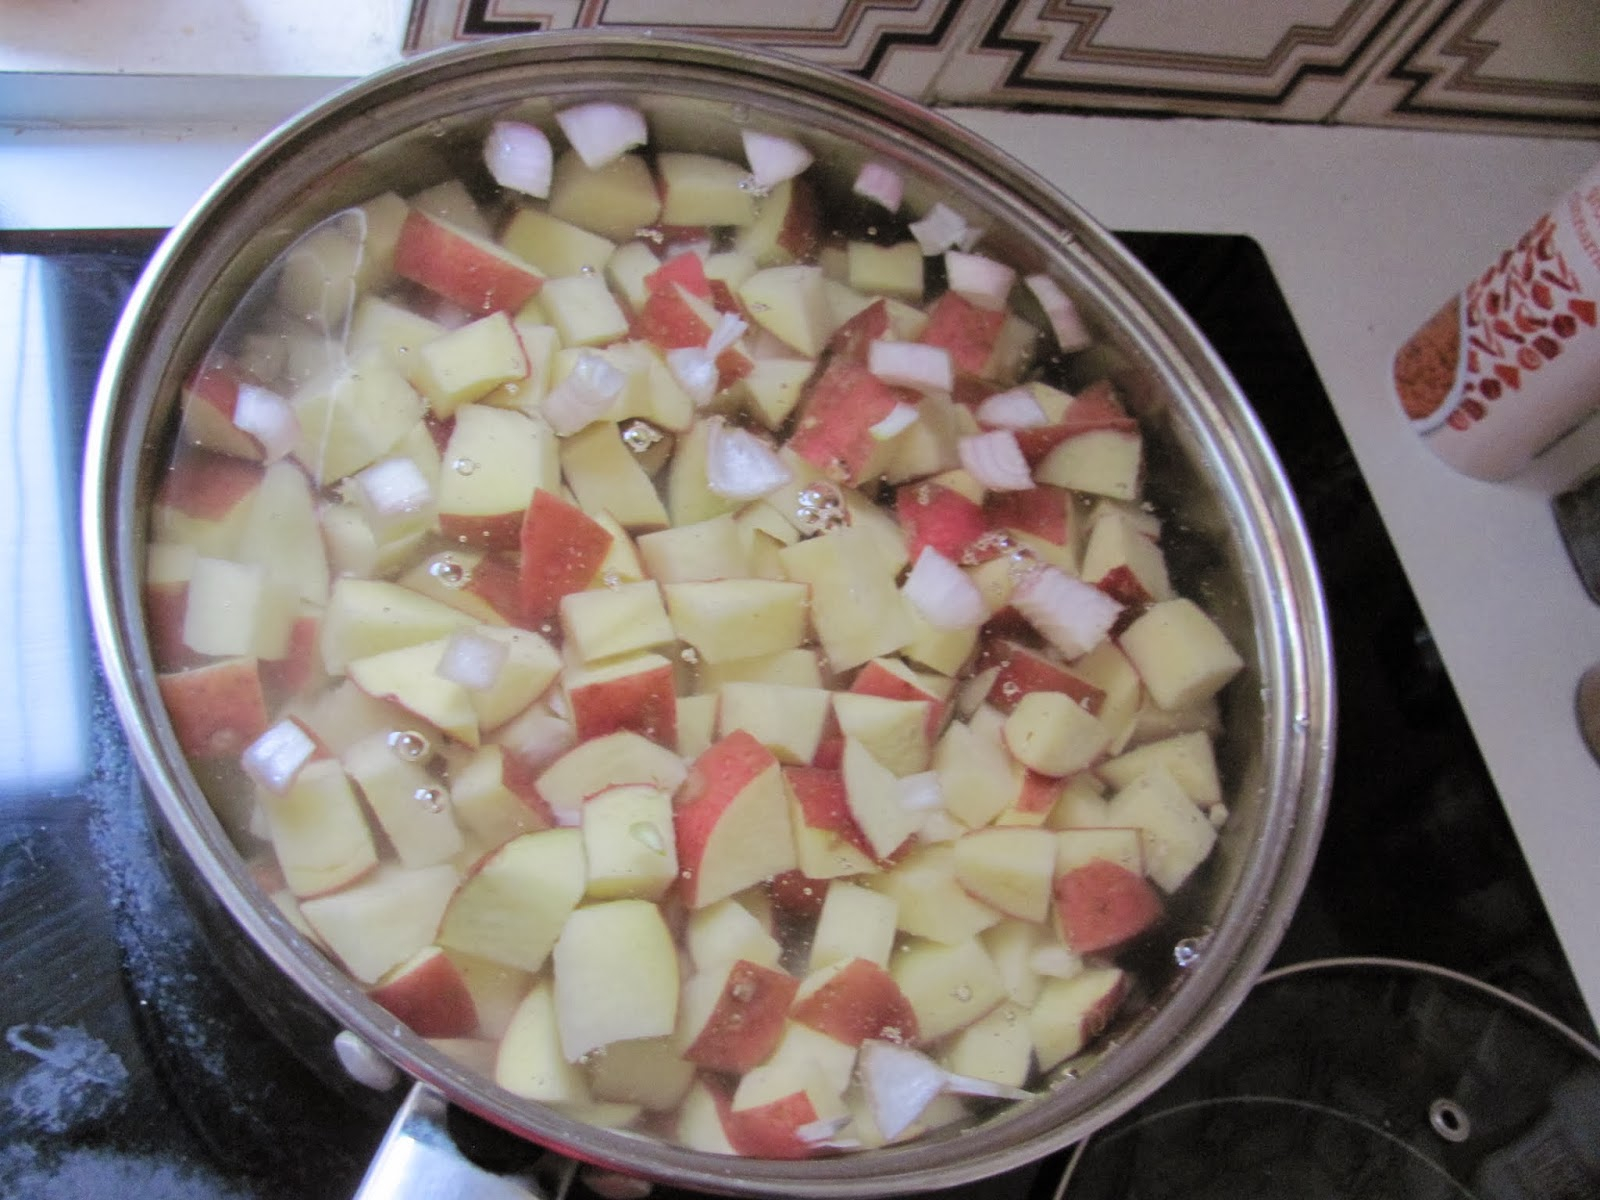 Potatoes boiling in a saucepan in Dublin Ireland Thanksgiving 2013